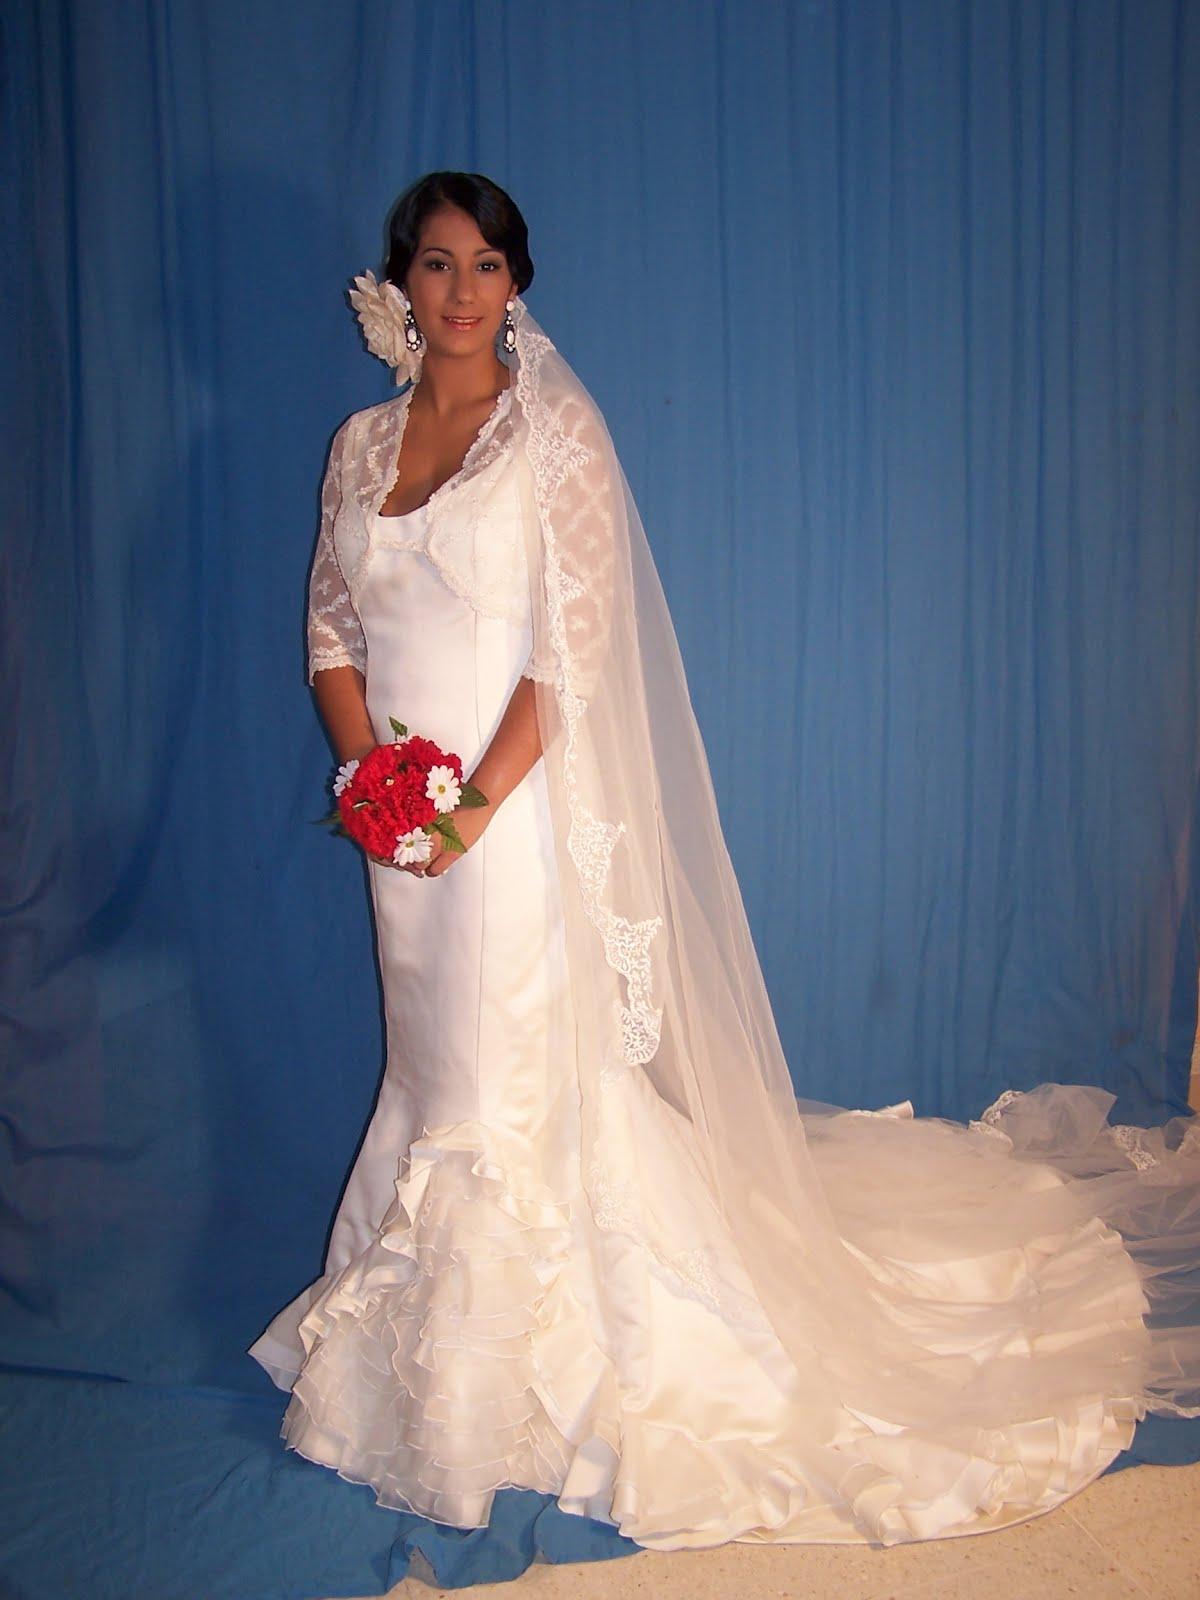 Ziemlich Vestidos De Novia Flamencos Bilder - Brautkleider Ideen ...